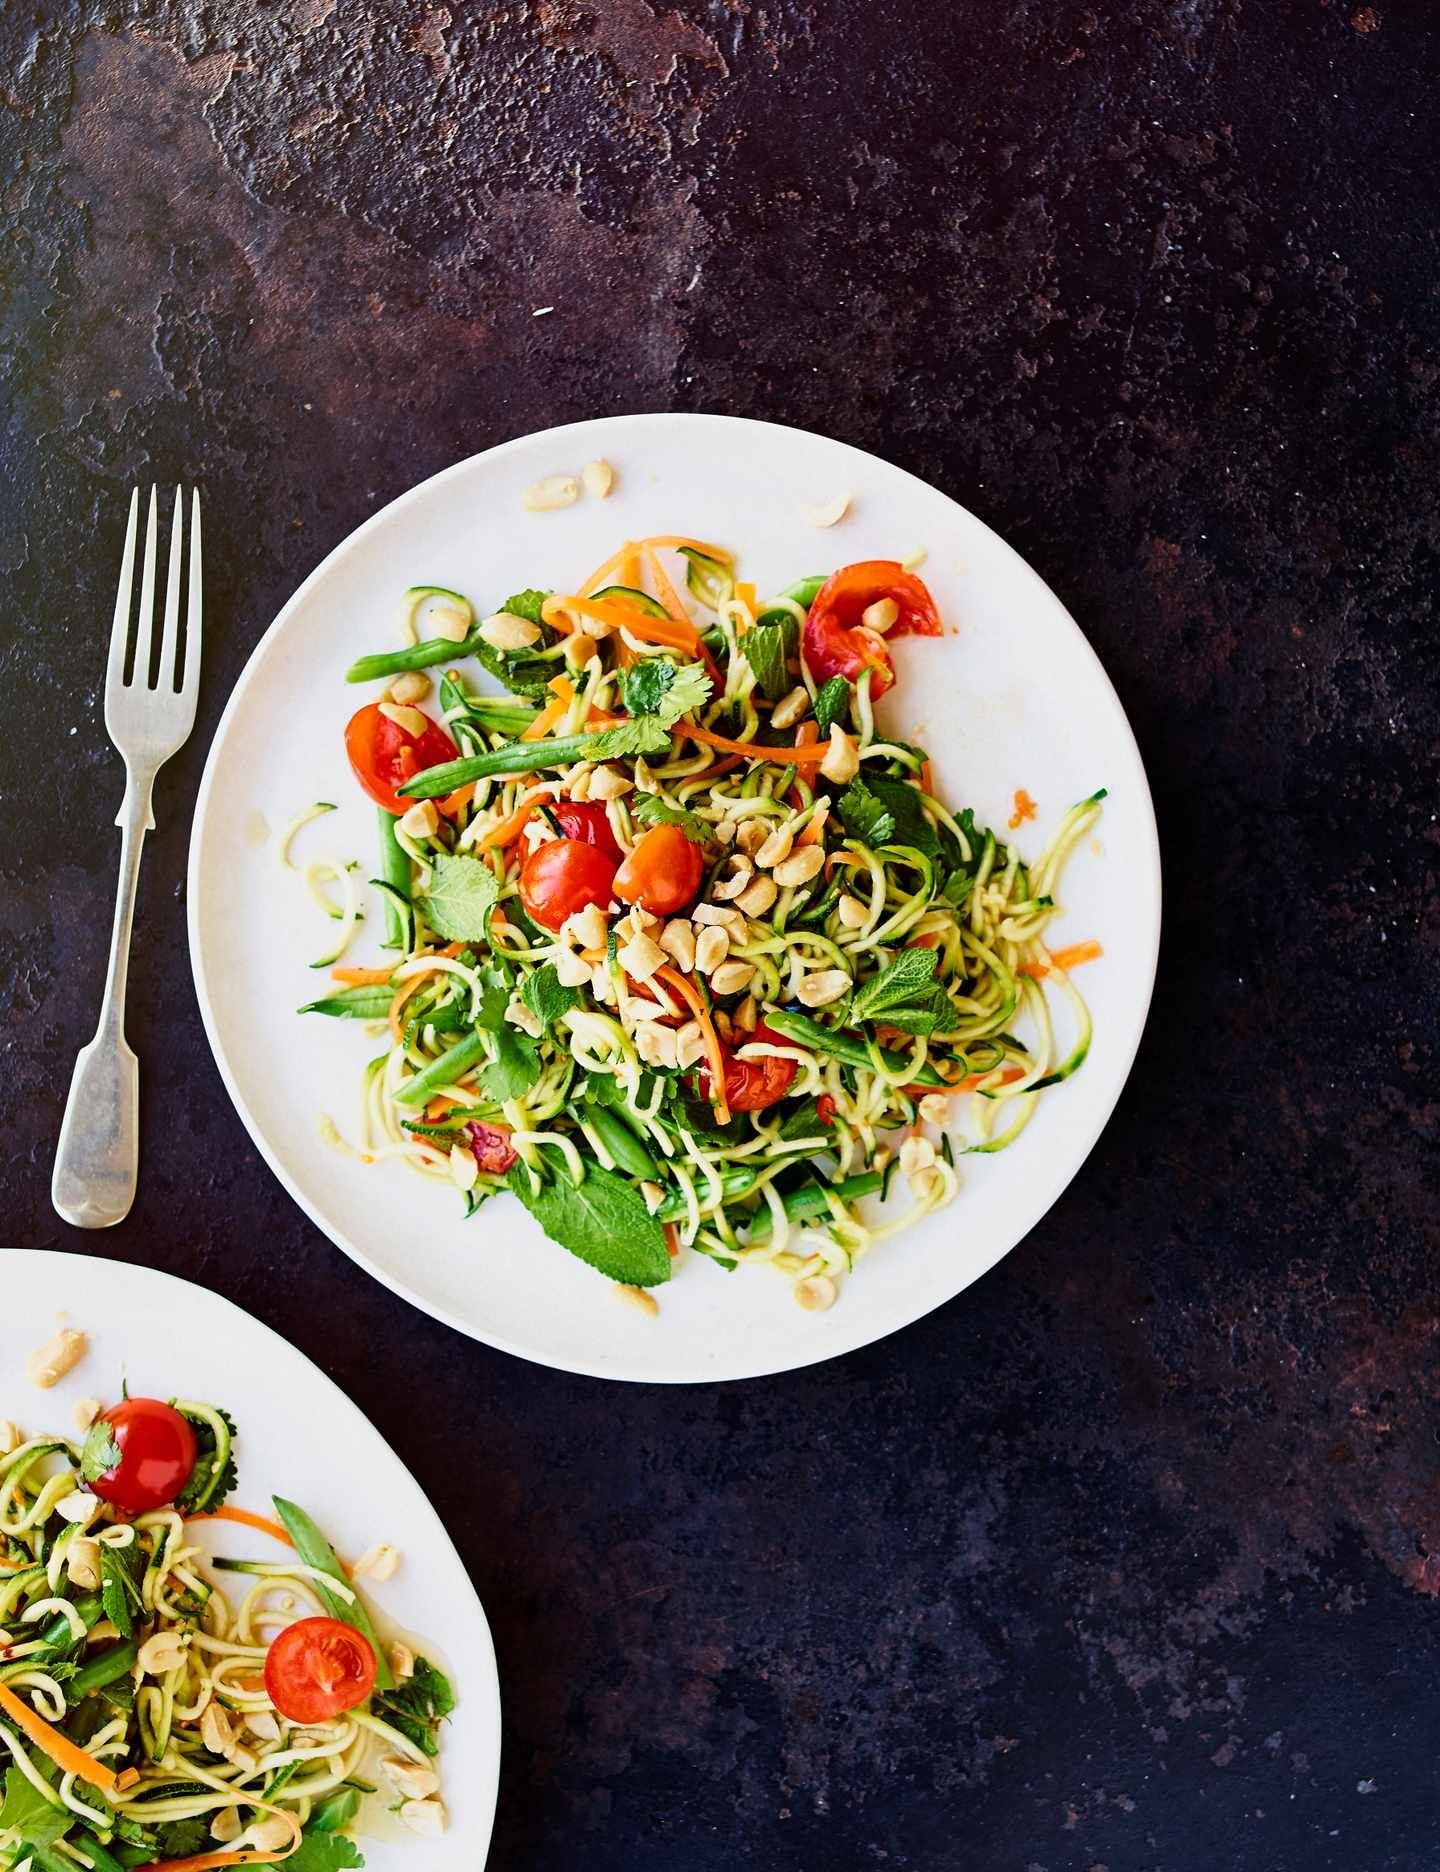 Healthy Vegetarian Recipes Under 300 Calories Recipe In